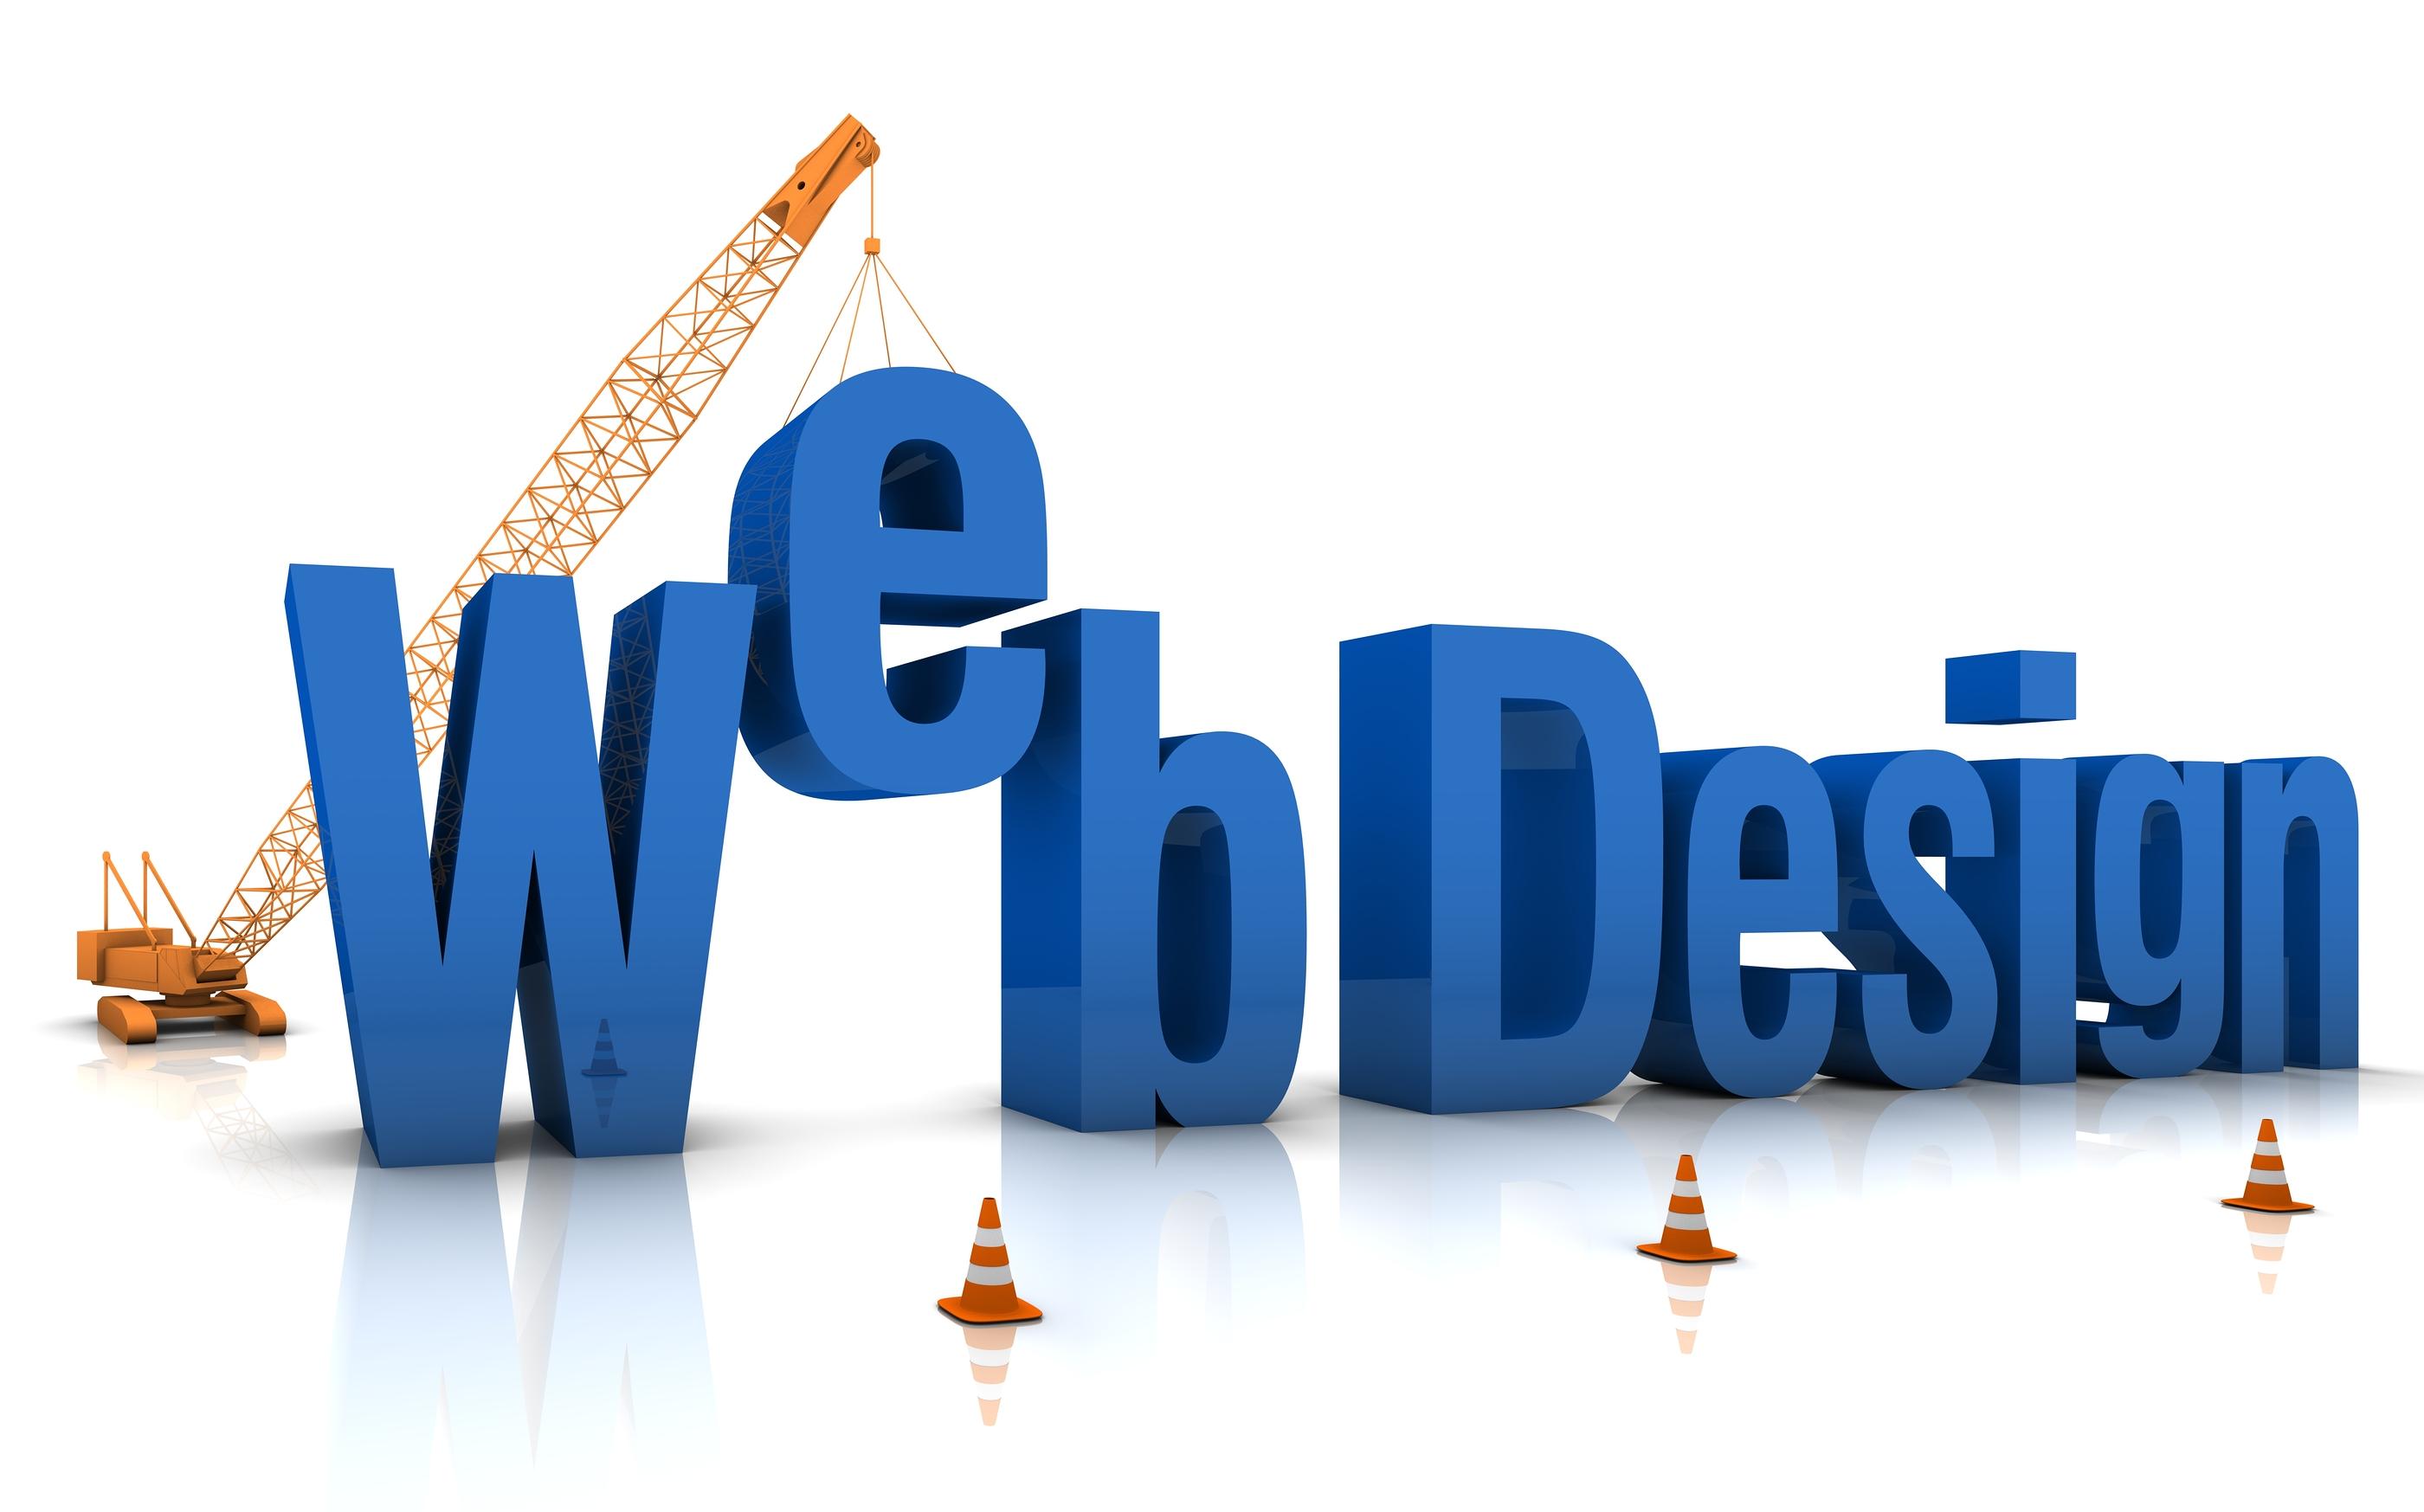 Choose Your Web Design Company